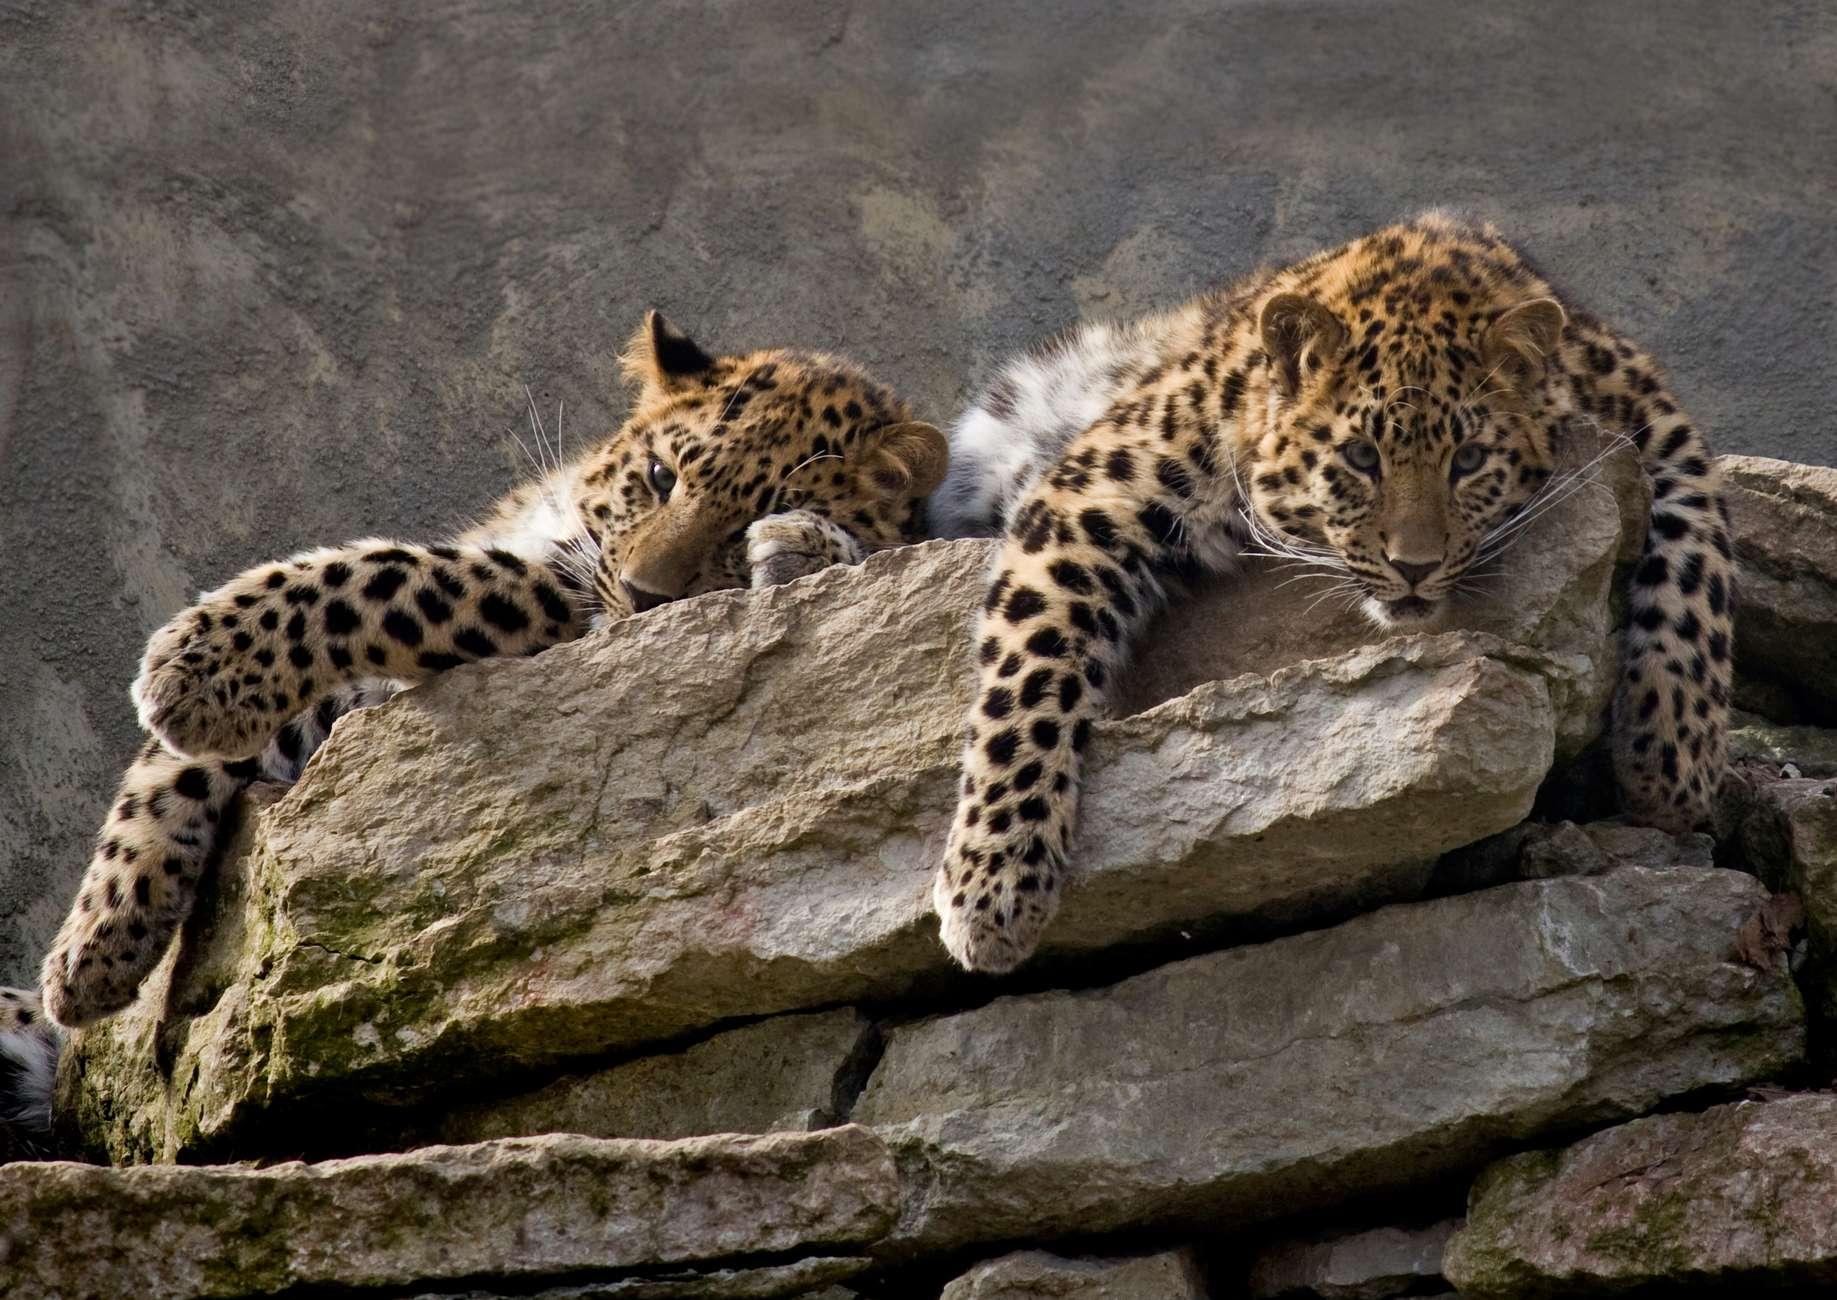 Amur Leopards at the Tallinn Zoo in Estonia